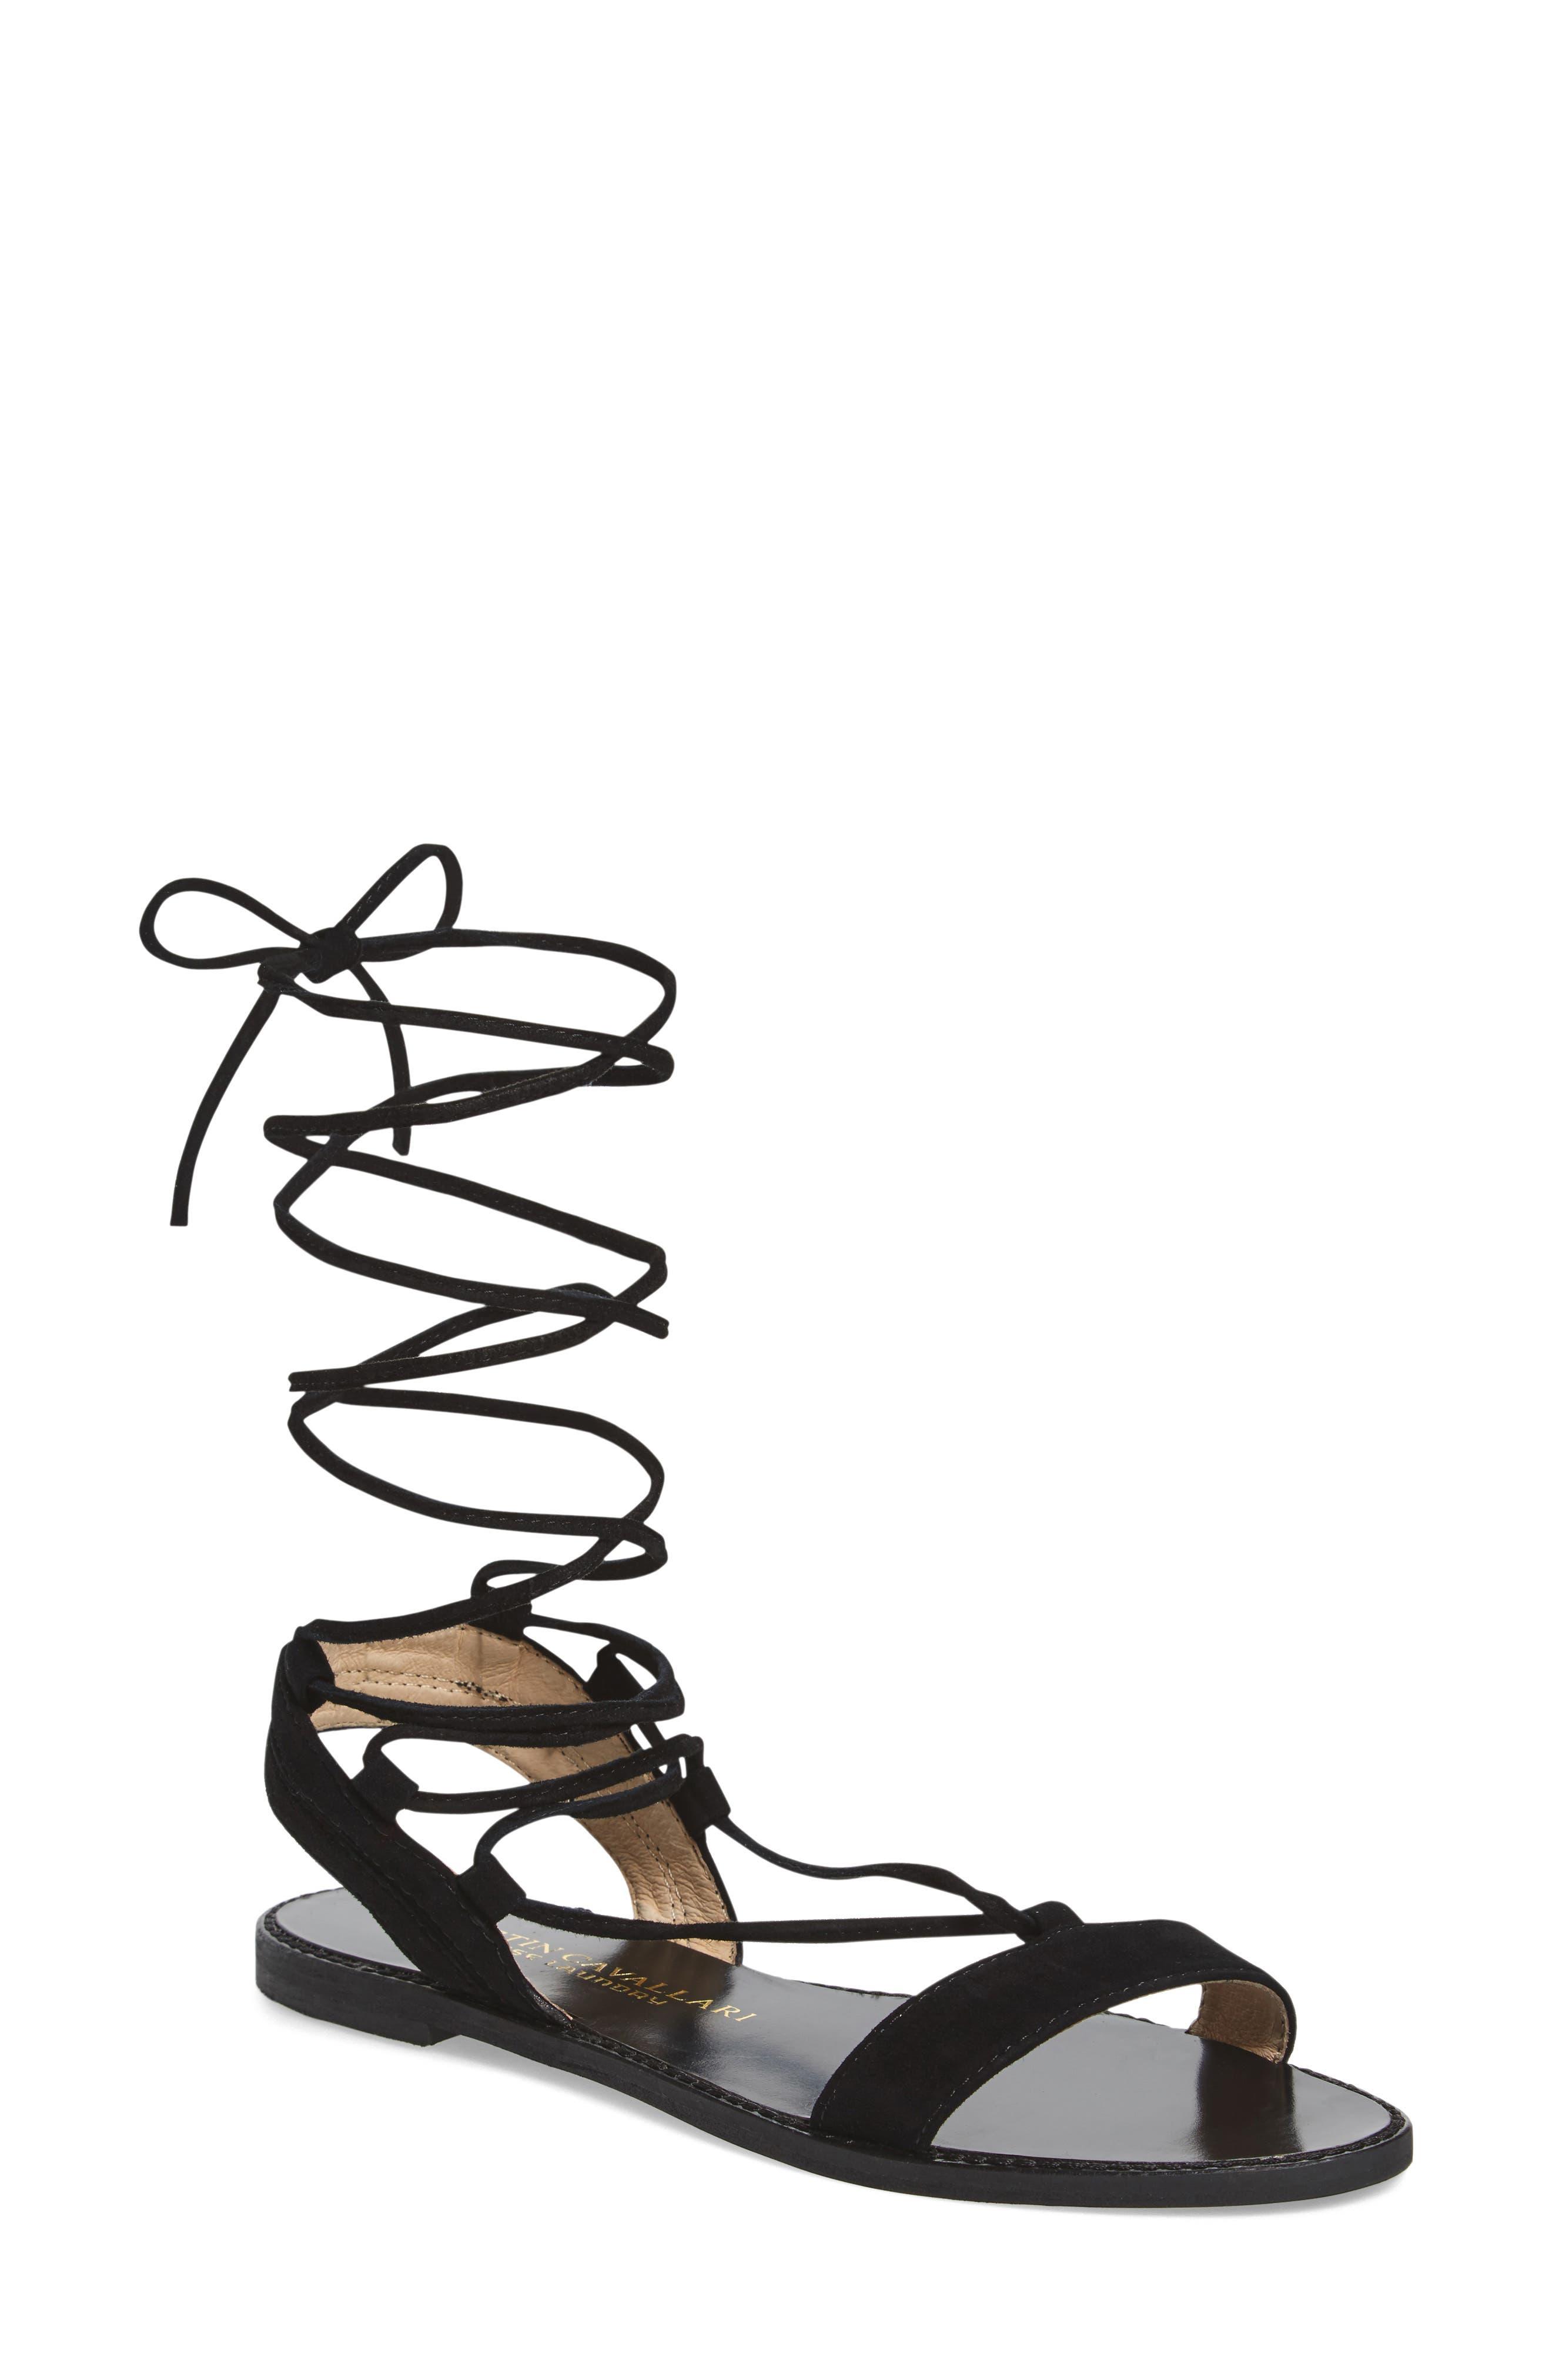 Brea Ankle Wrap Sandal,                             Main thumbnail 1, color,